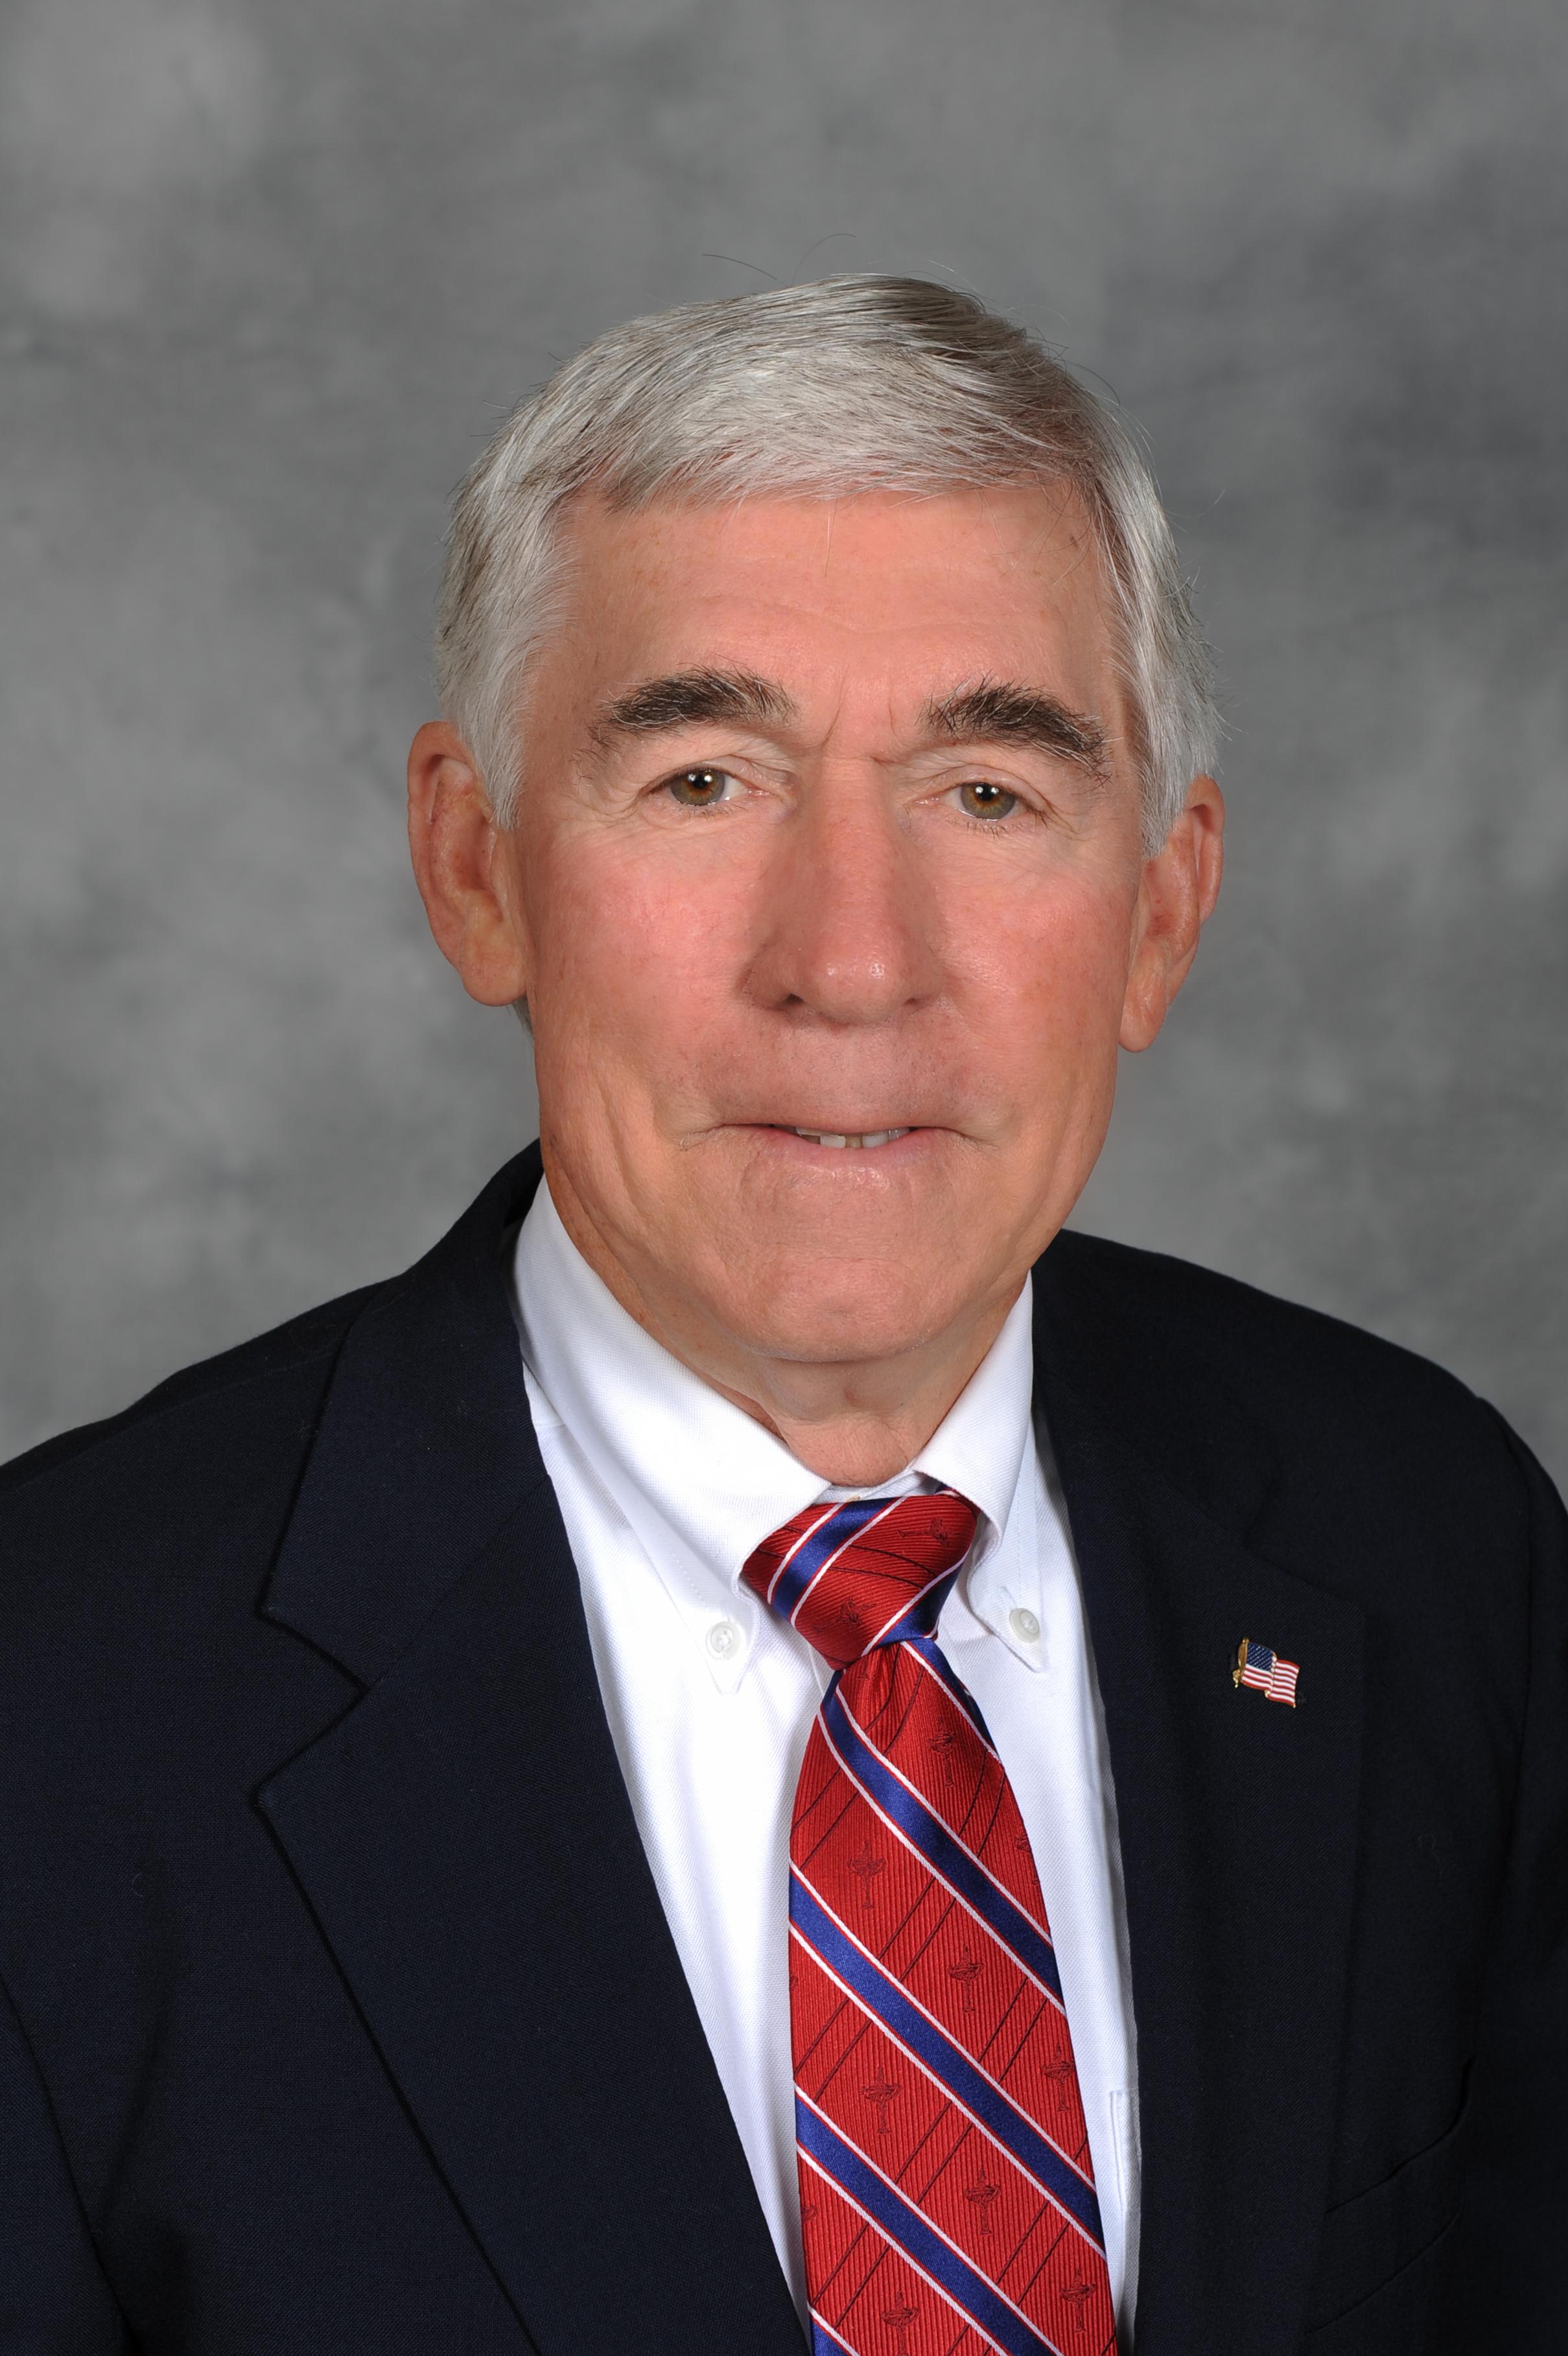 Headshot of former Boadr Chairman Charles M. Thrash